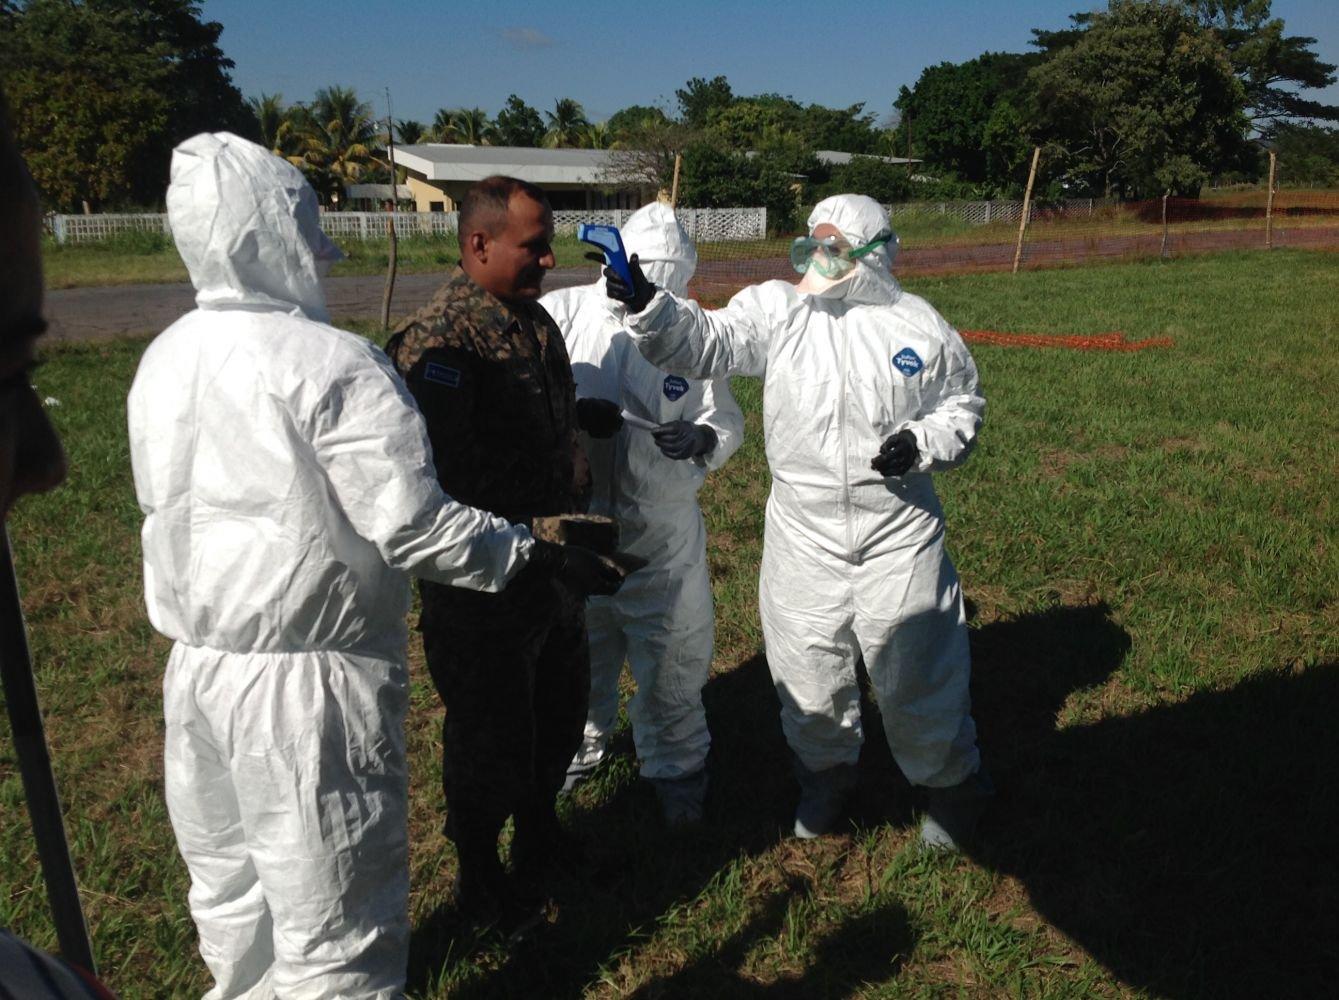 Salvadoran, Uruguayan Peacekeepers Deploying to Africa Train on Ebola Precautions and Response